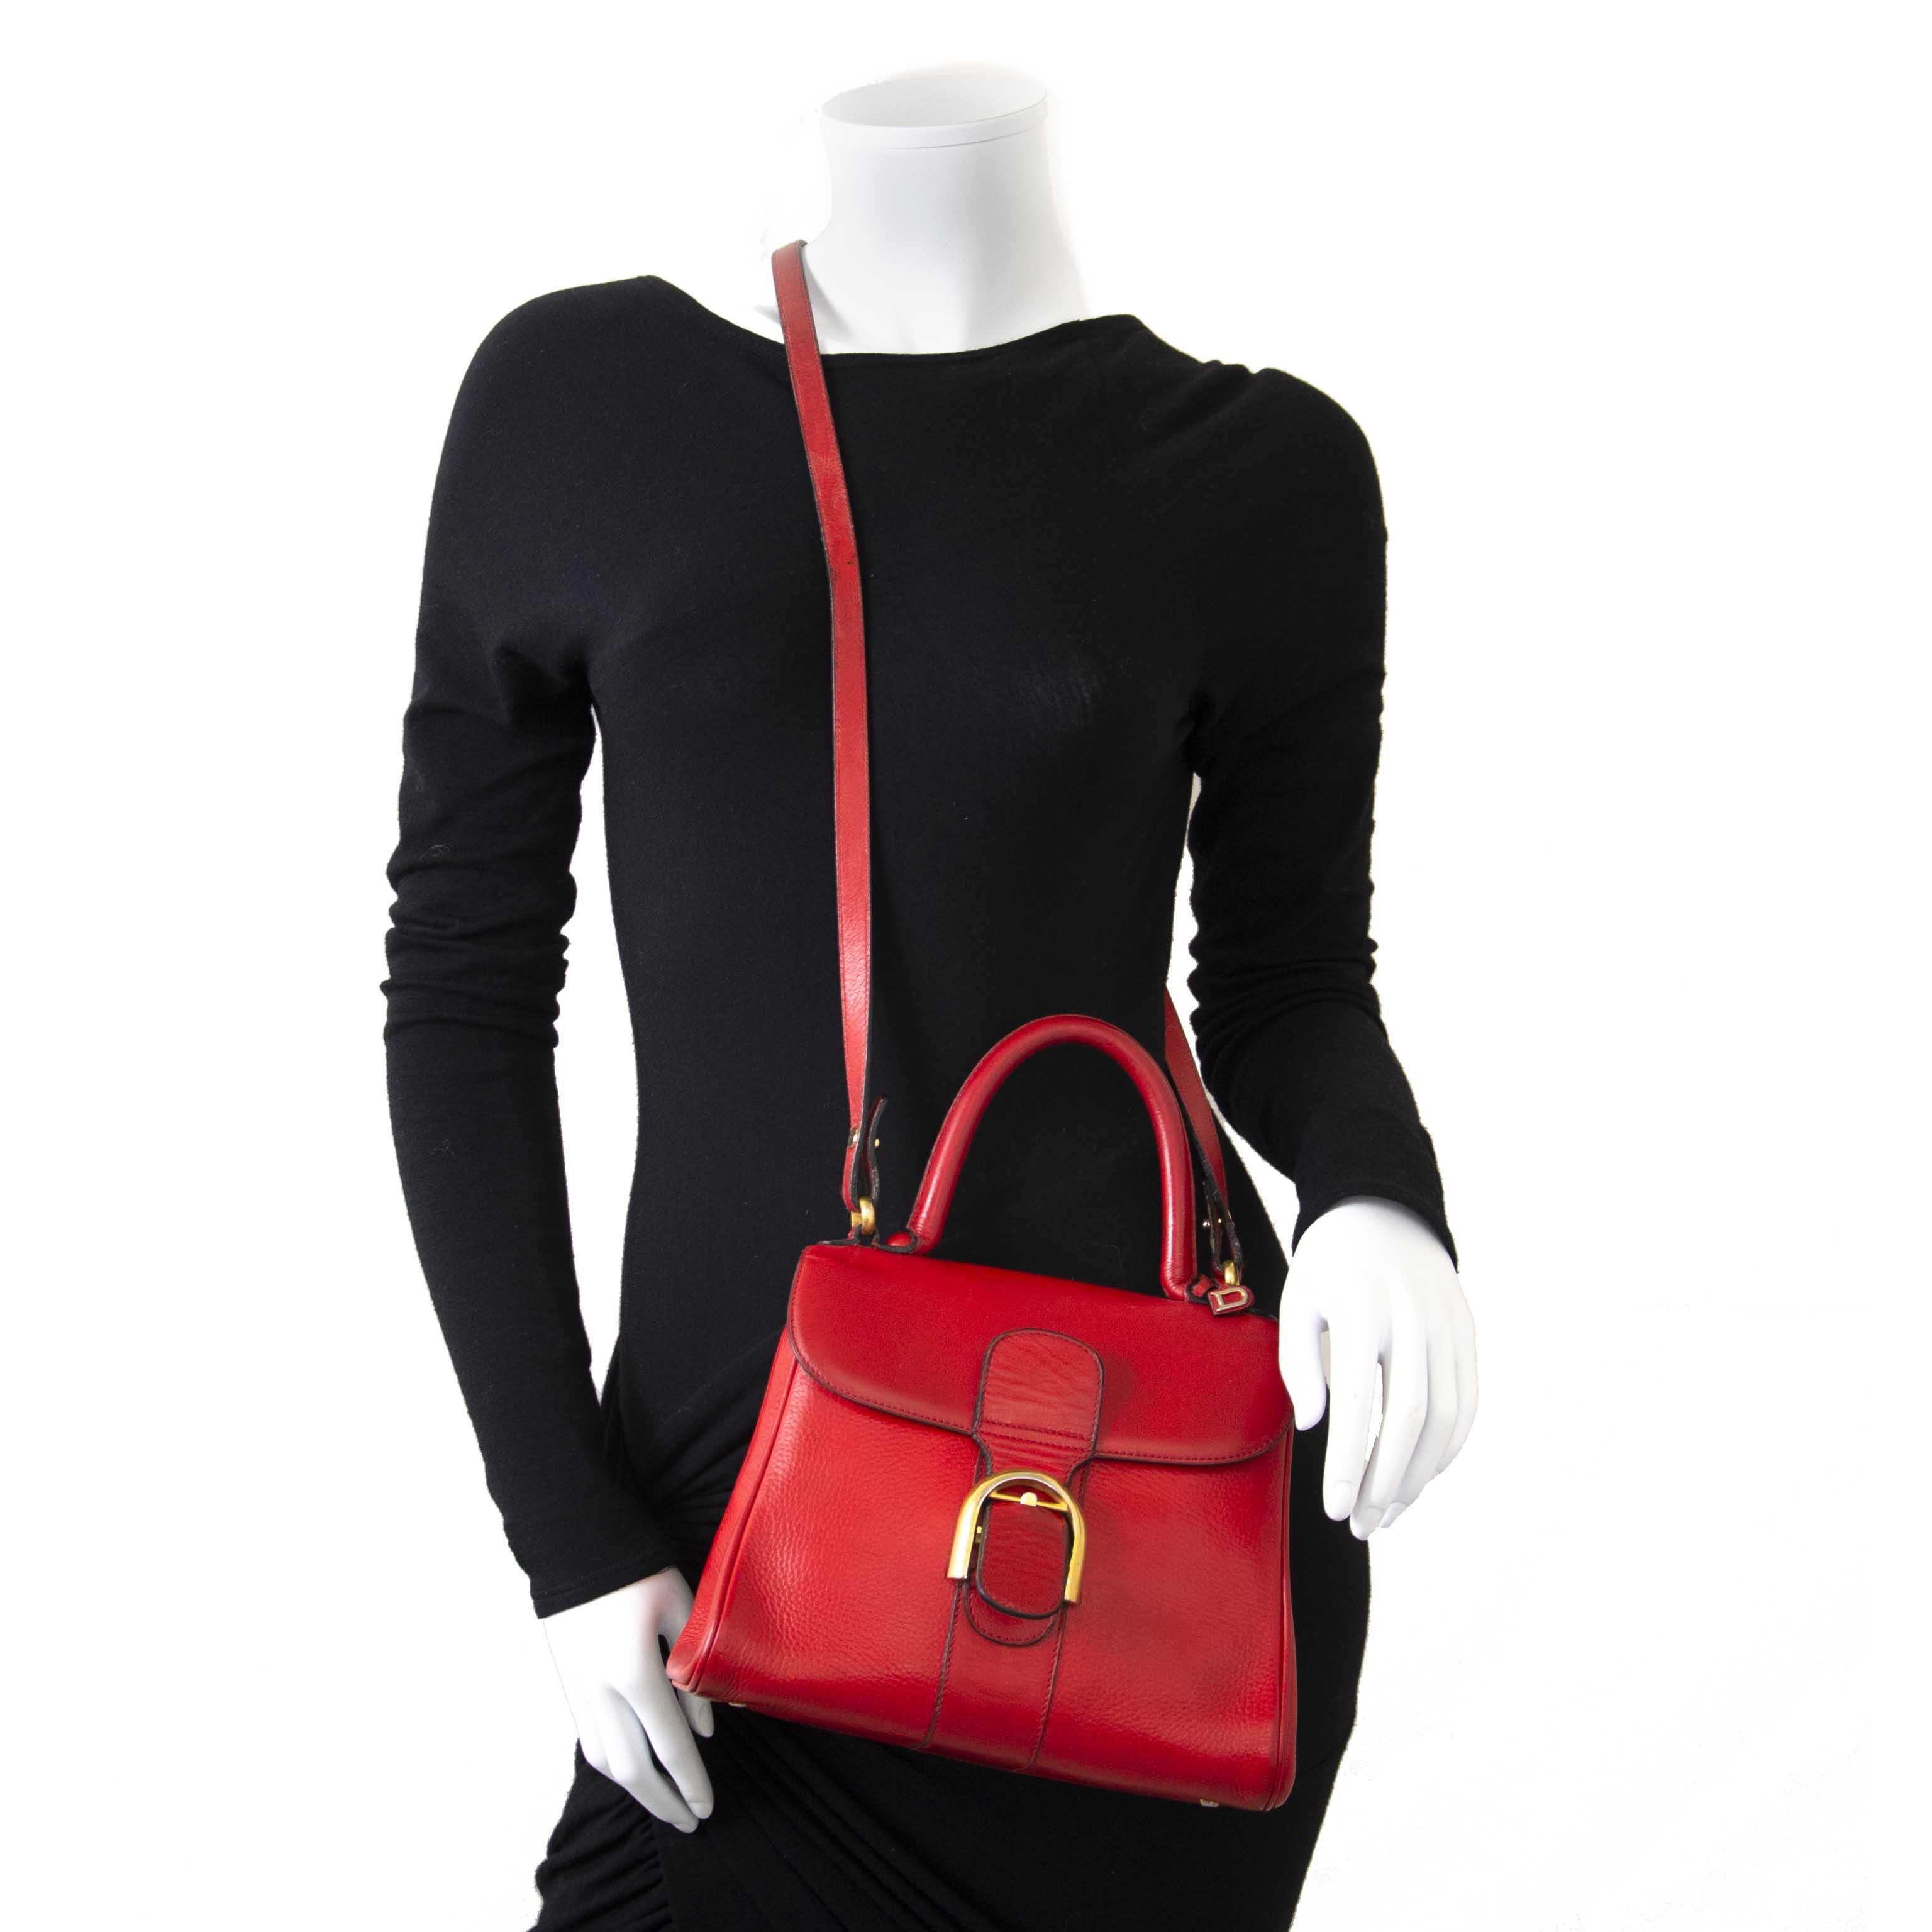 748adae24287 ... Delvaux Red Brillant PM Bag + Strap now for sale at labellov vintage  fashion webshop belgium